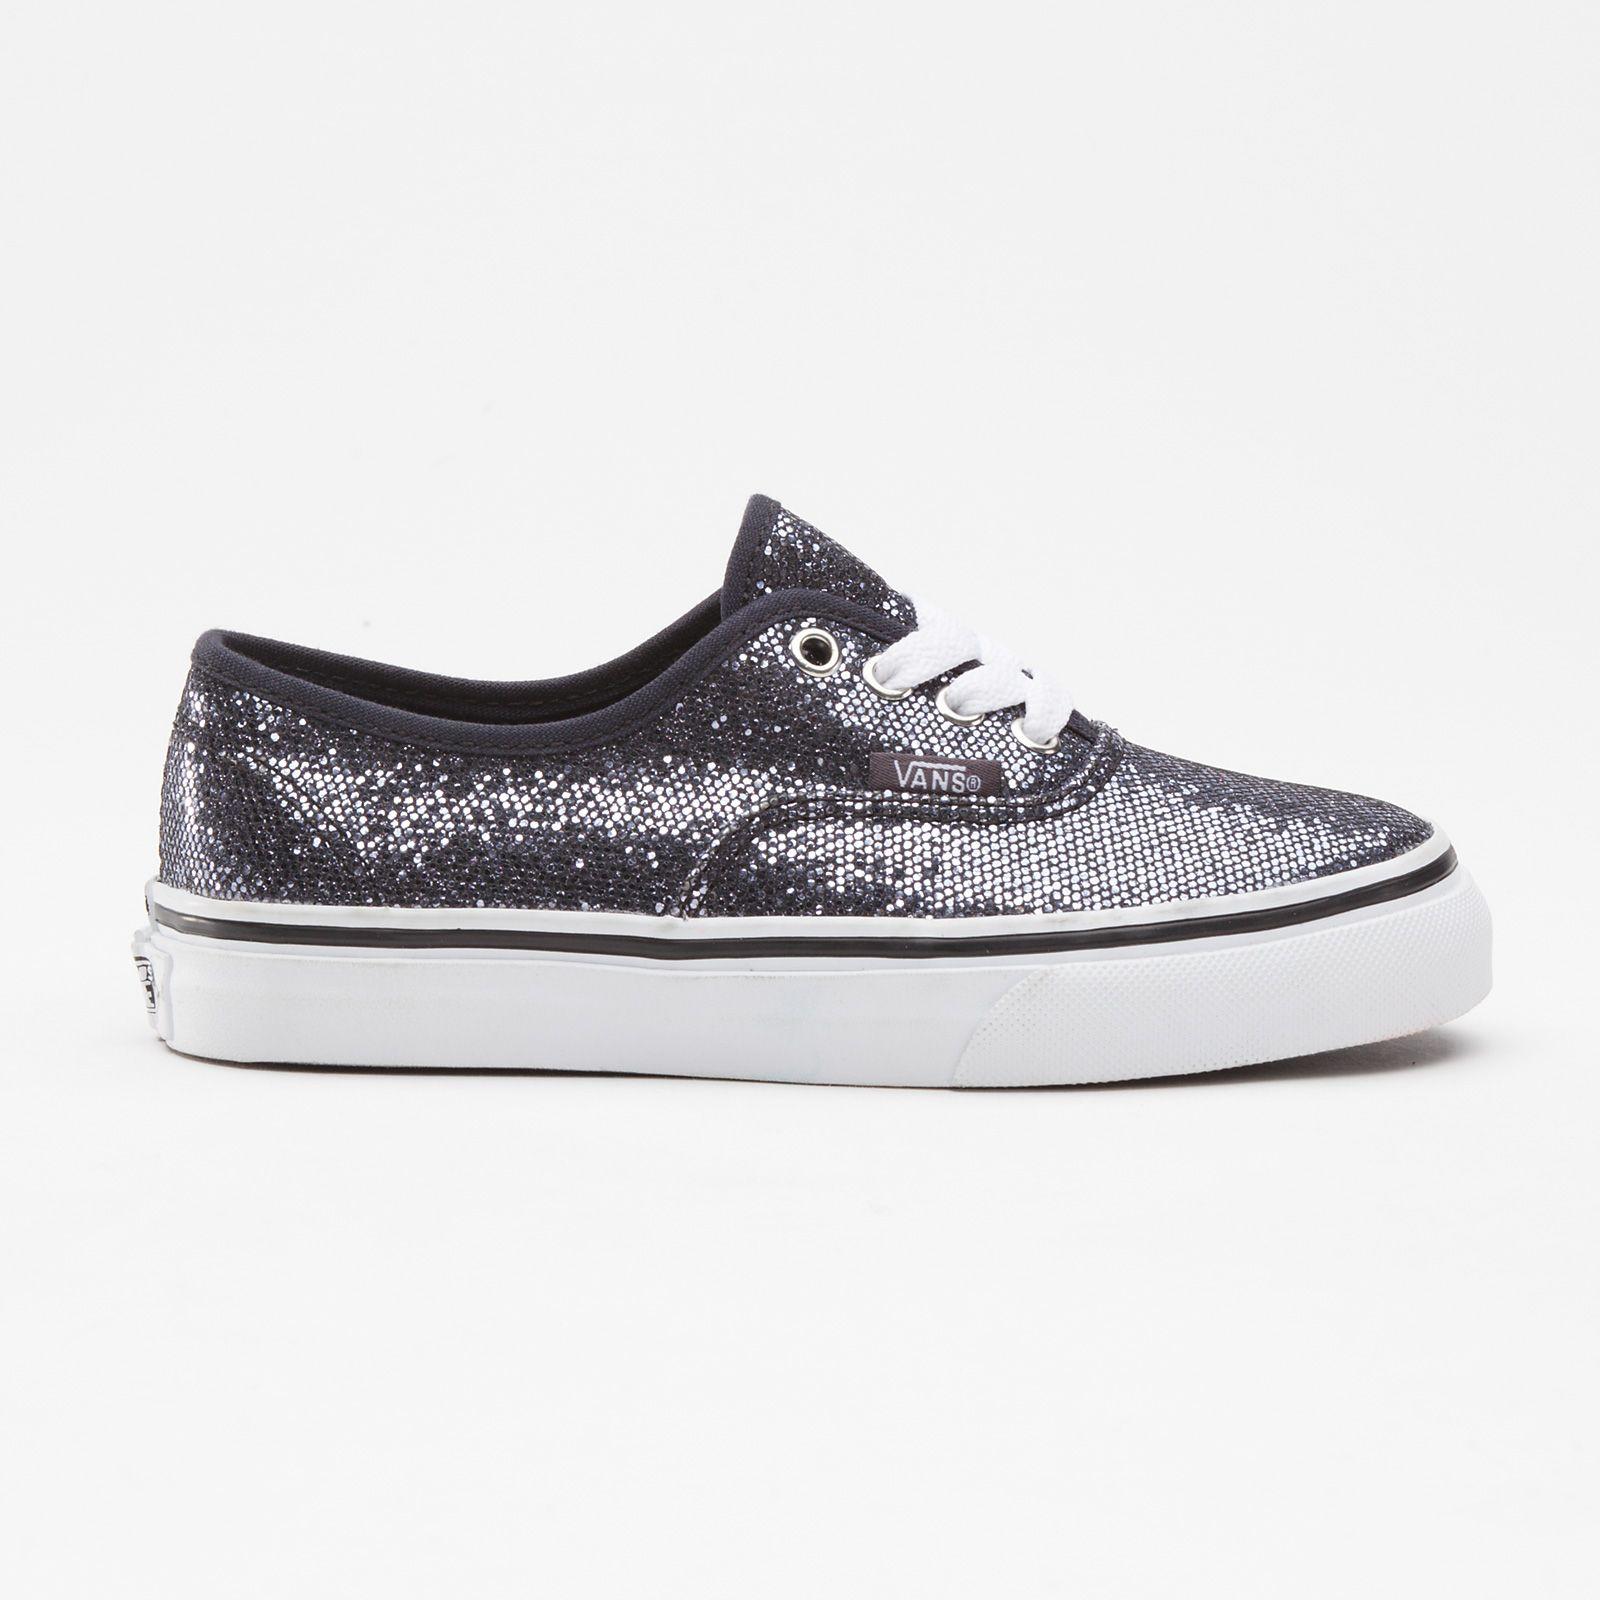 Glitter vans size 7 | Vans, Sparkly